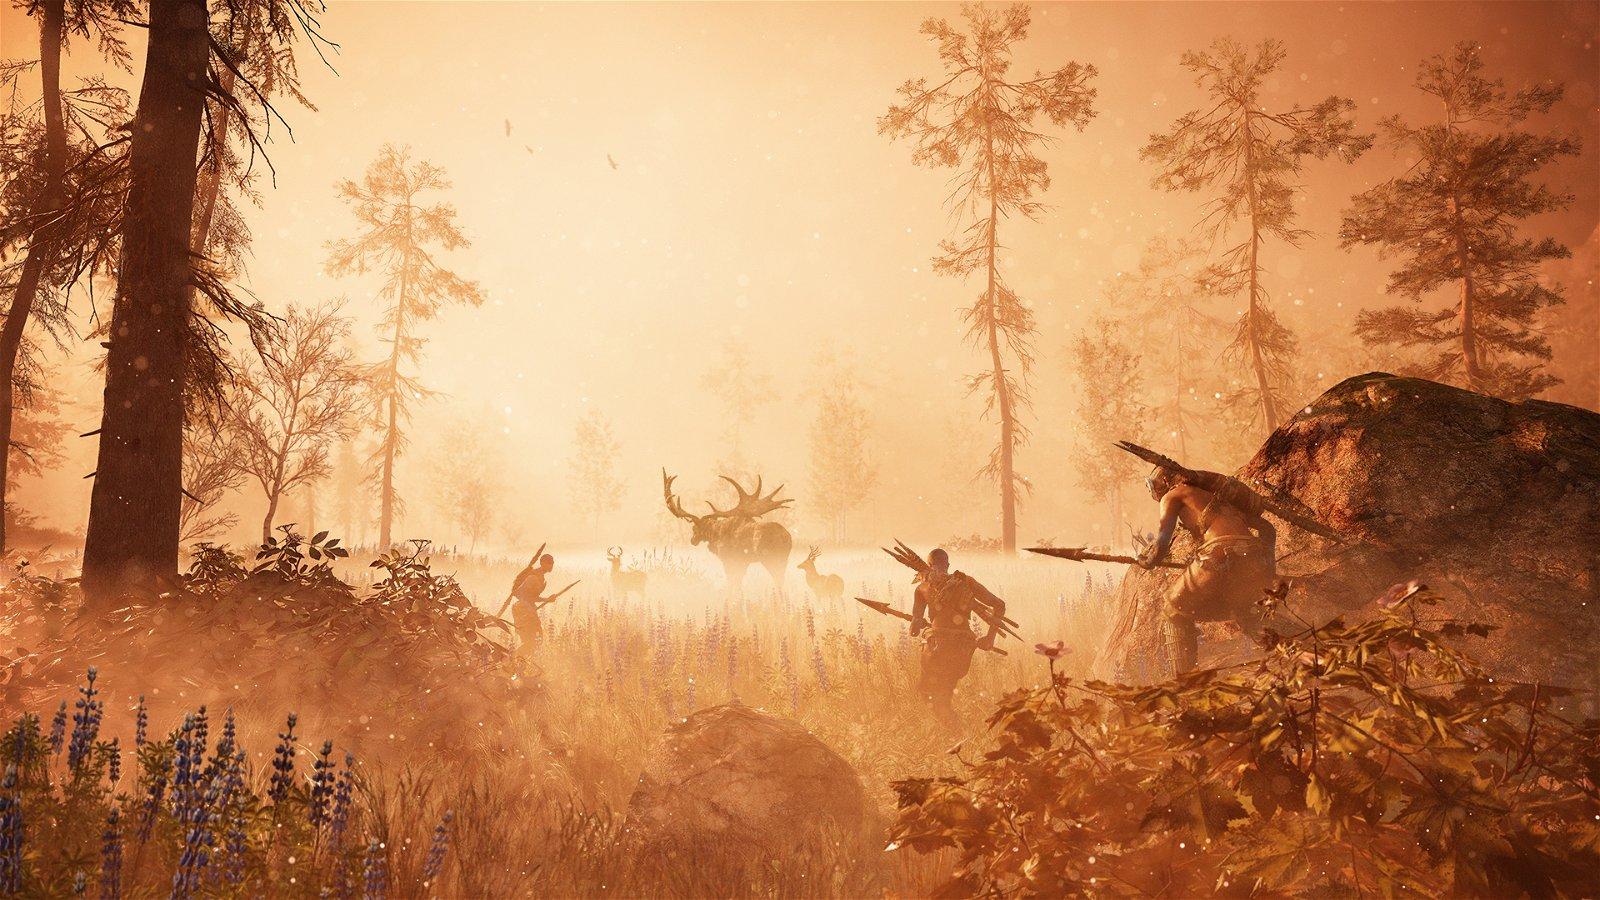 Hunting_Elk_Gold_1080P_1449171013